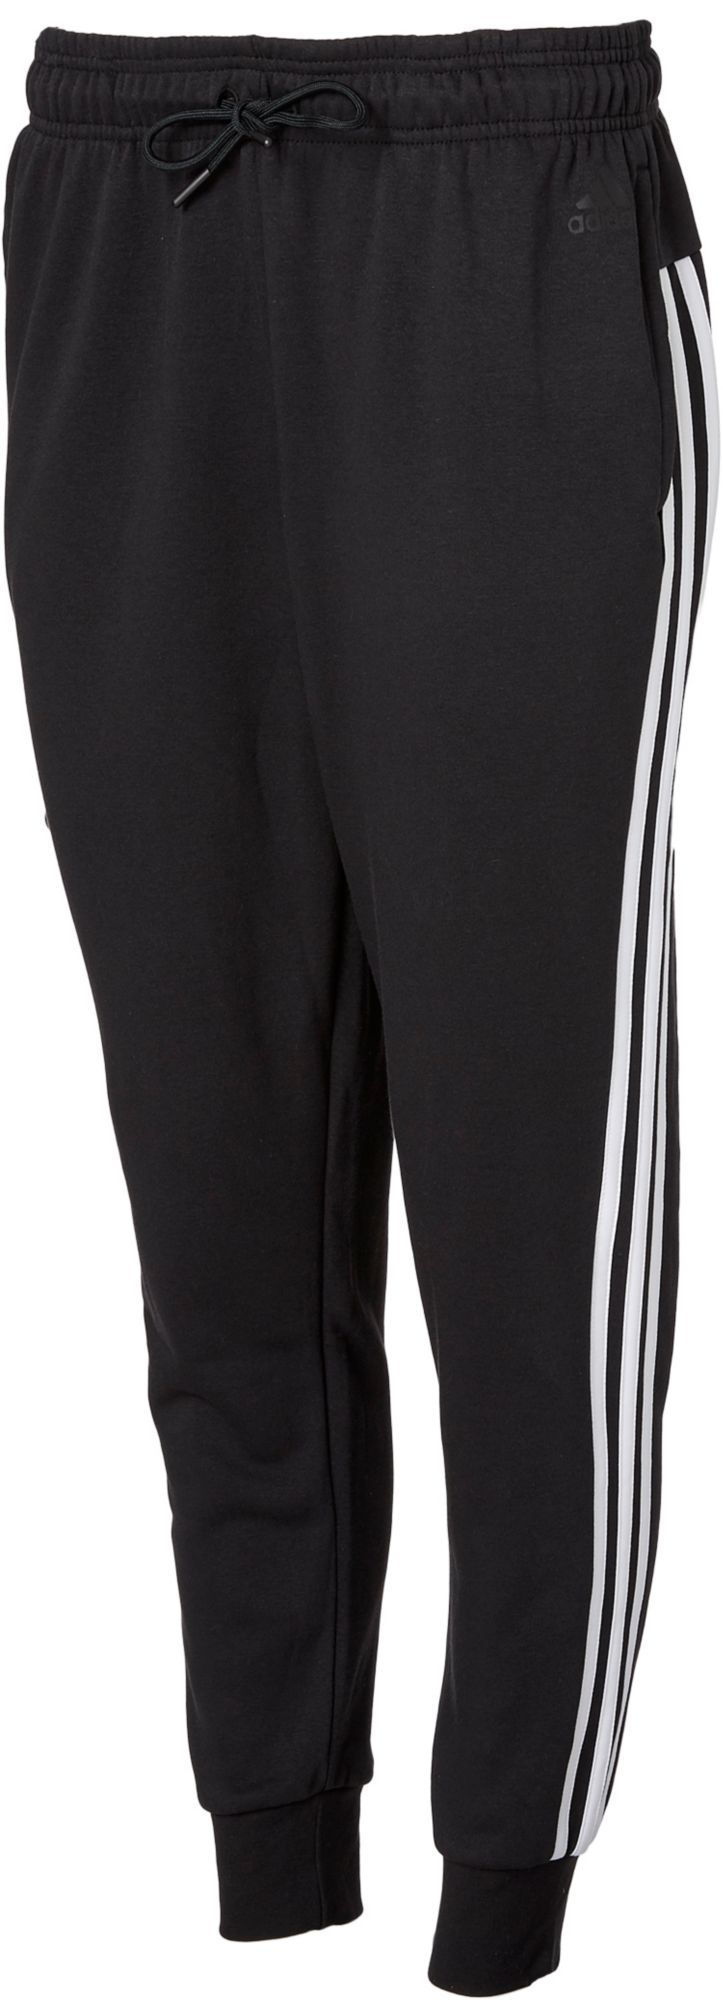 98f1f1823ef308 adidas Women's Essentials Cotton Fleece 3-Stripes Jogger Pants, Size: XS,  Black